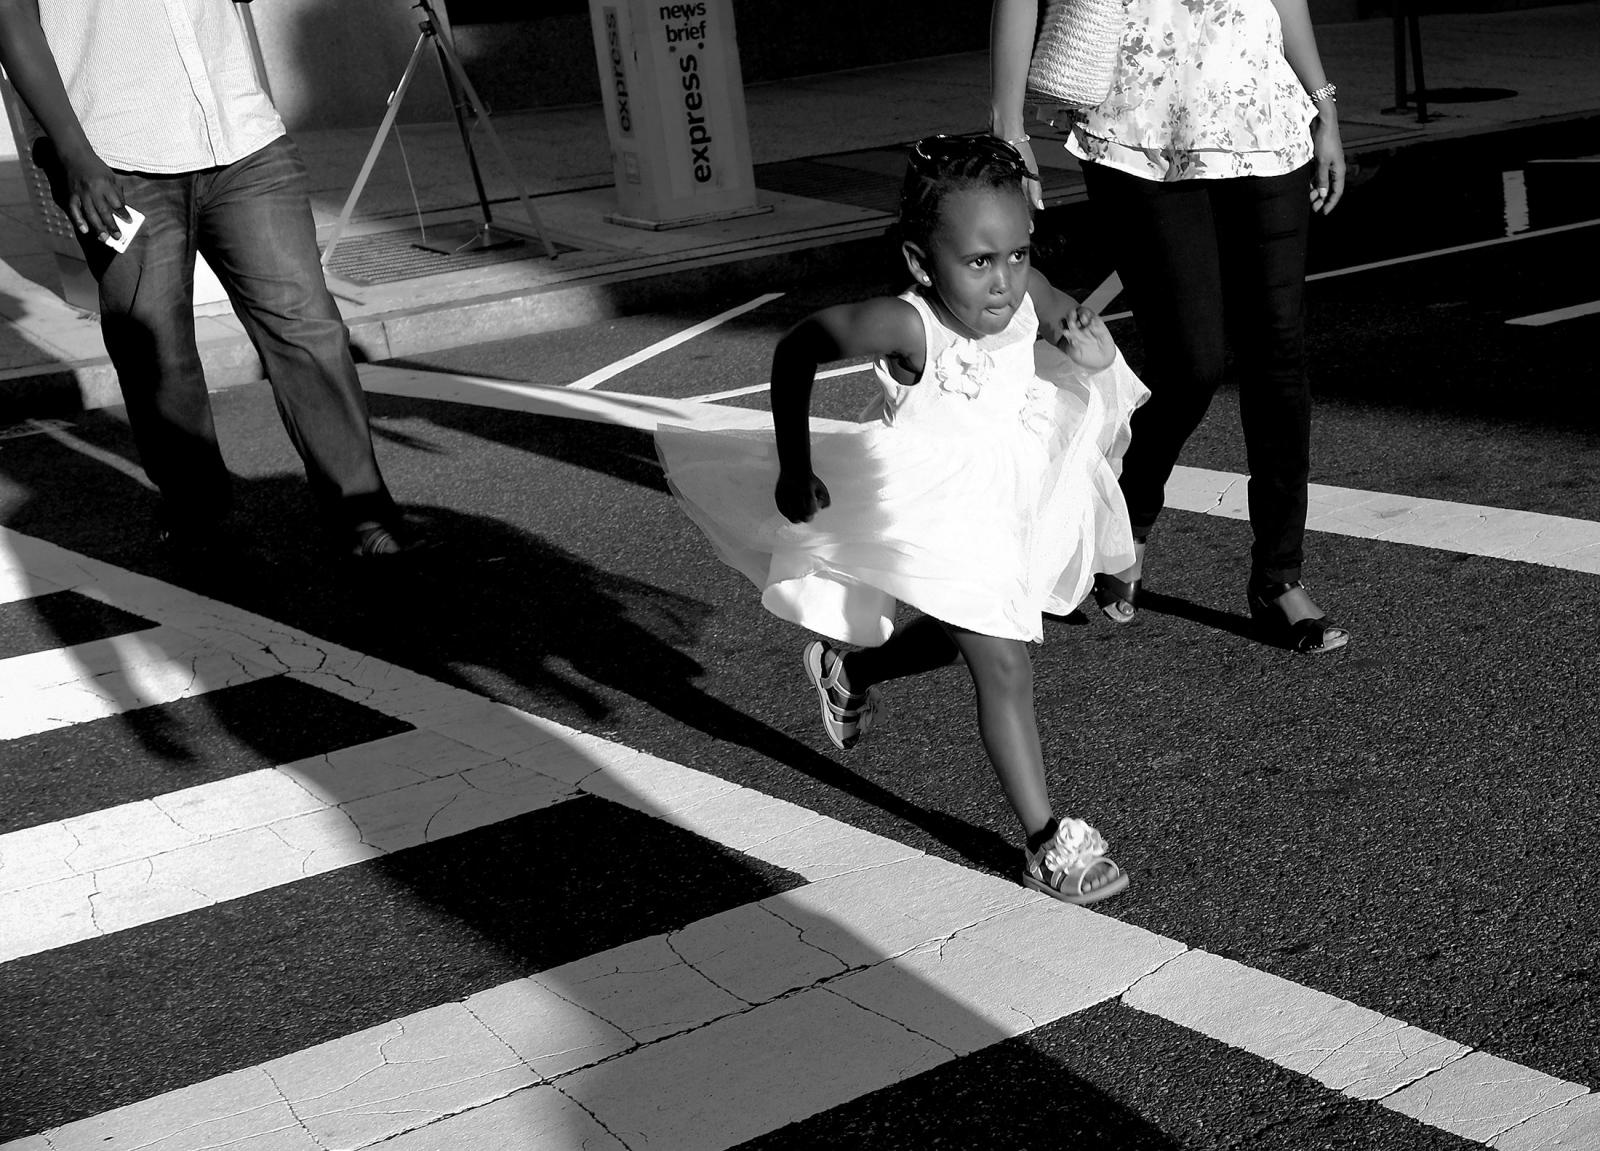 Photography image - Loading runninggirl.jpg